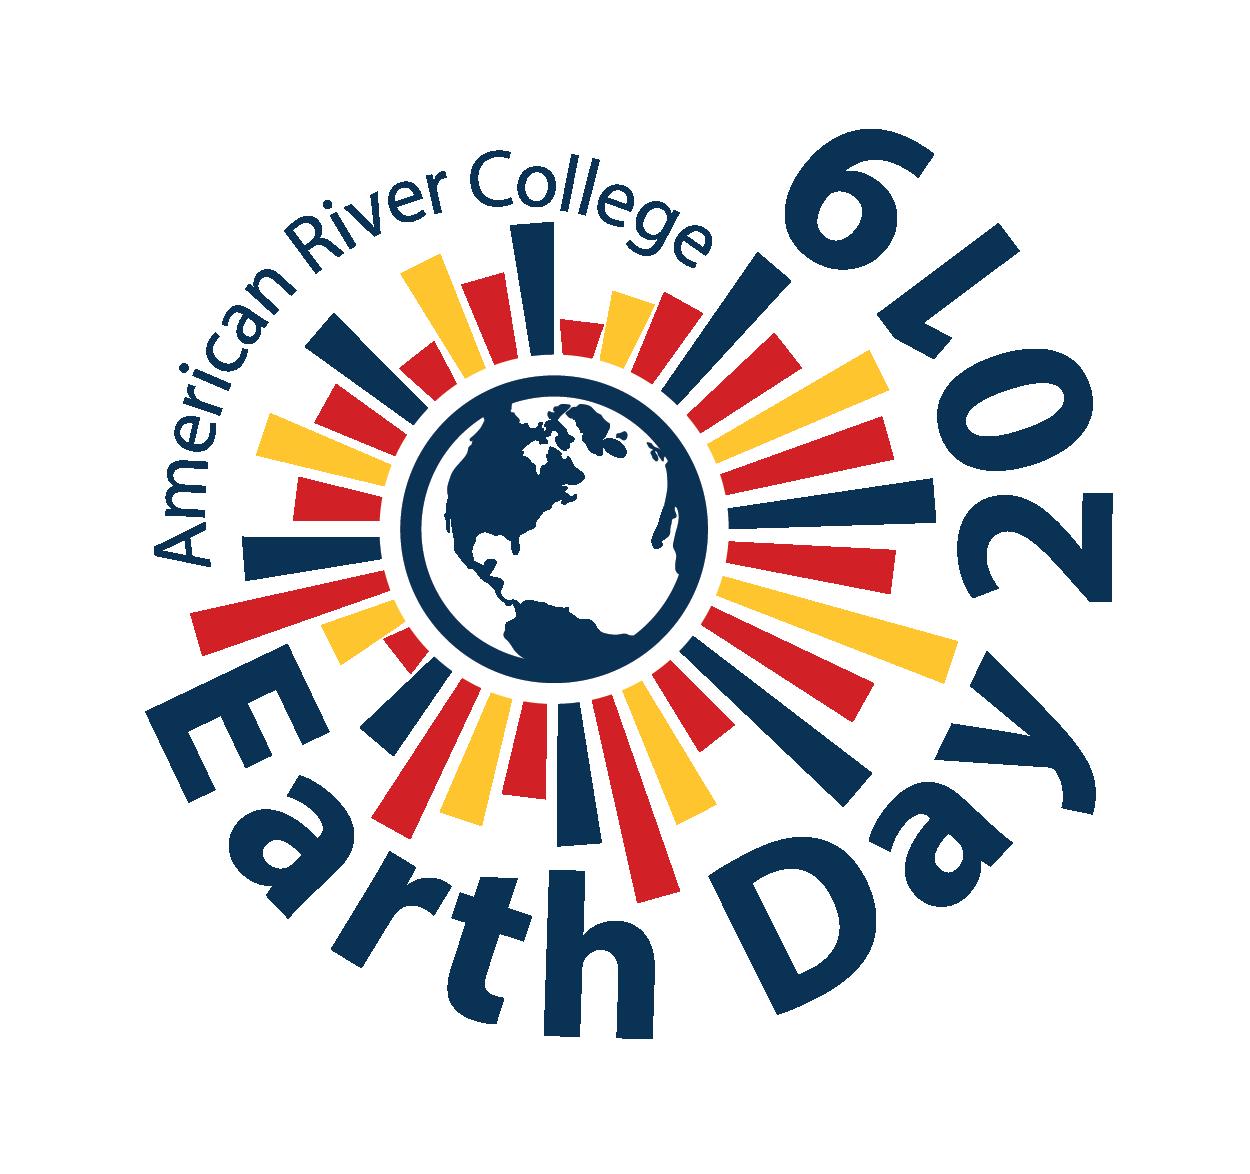 American River College 2019 Earth Day Celebration // REUSE & REPAIR